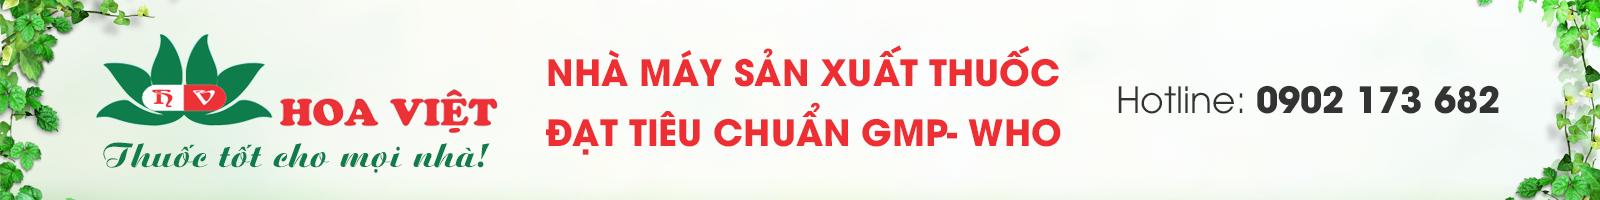 sanphamthaoduoc.vn